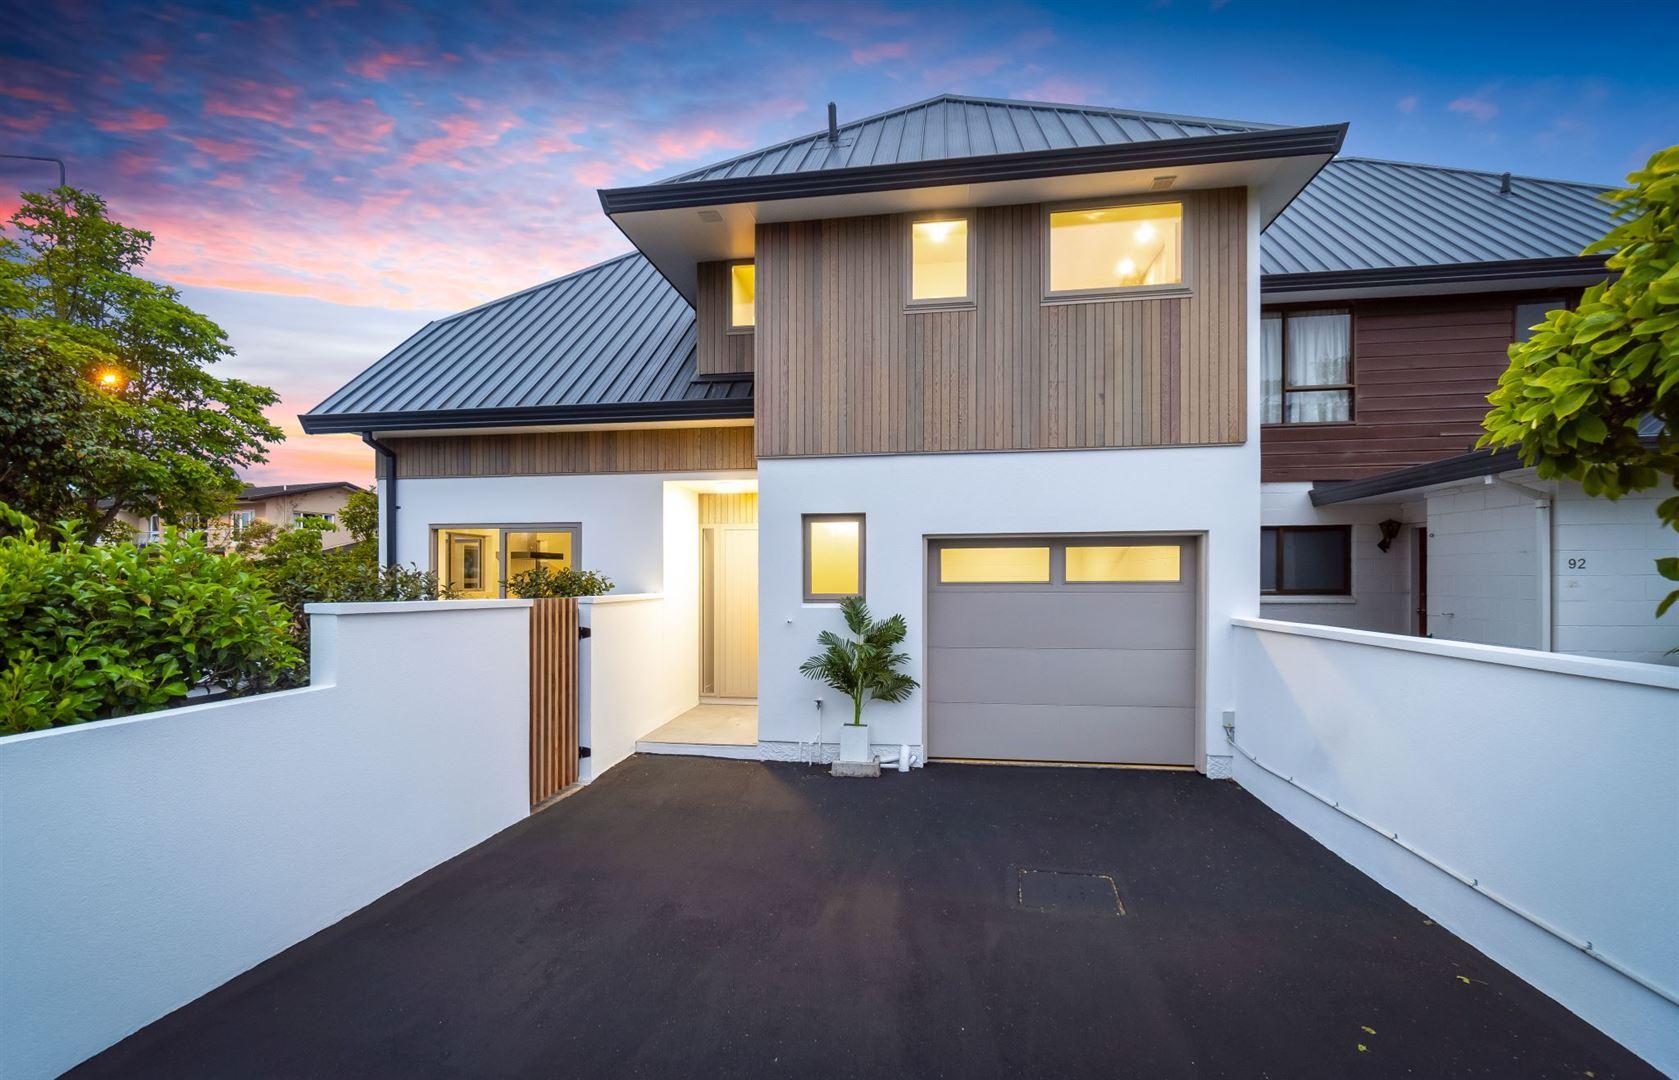 94 Wairarapa Terrace, Merivale - Christchurch City